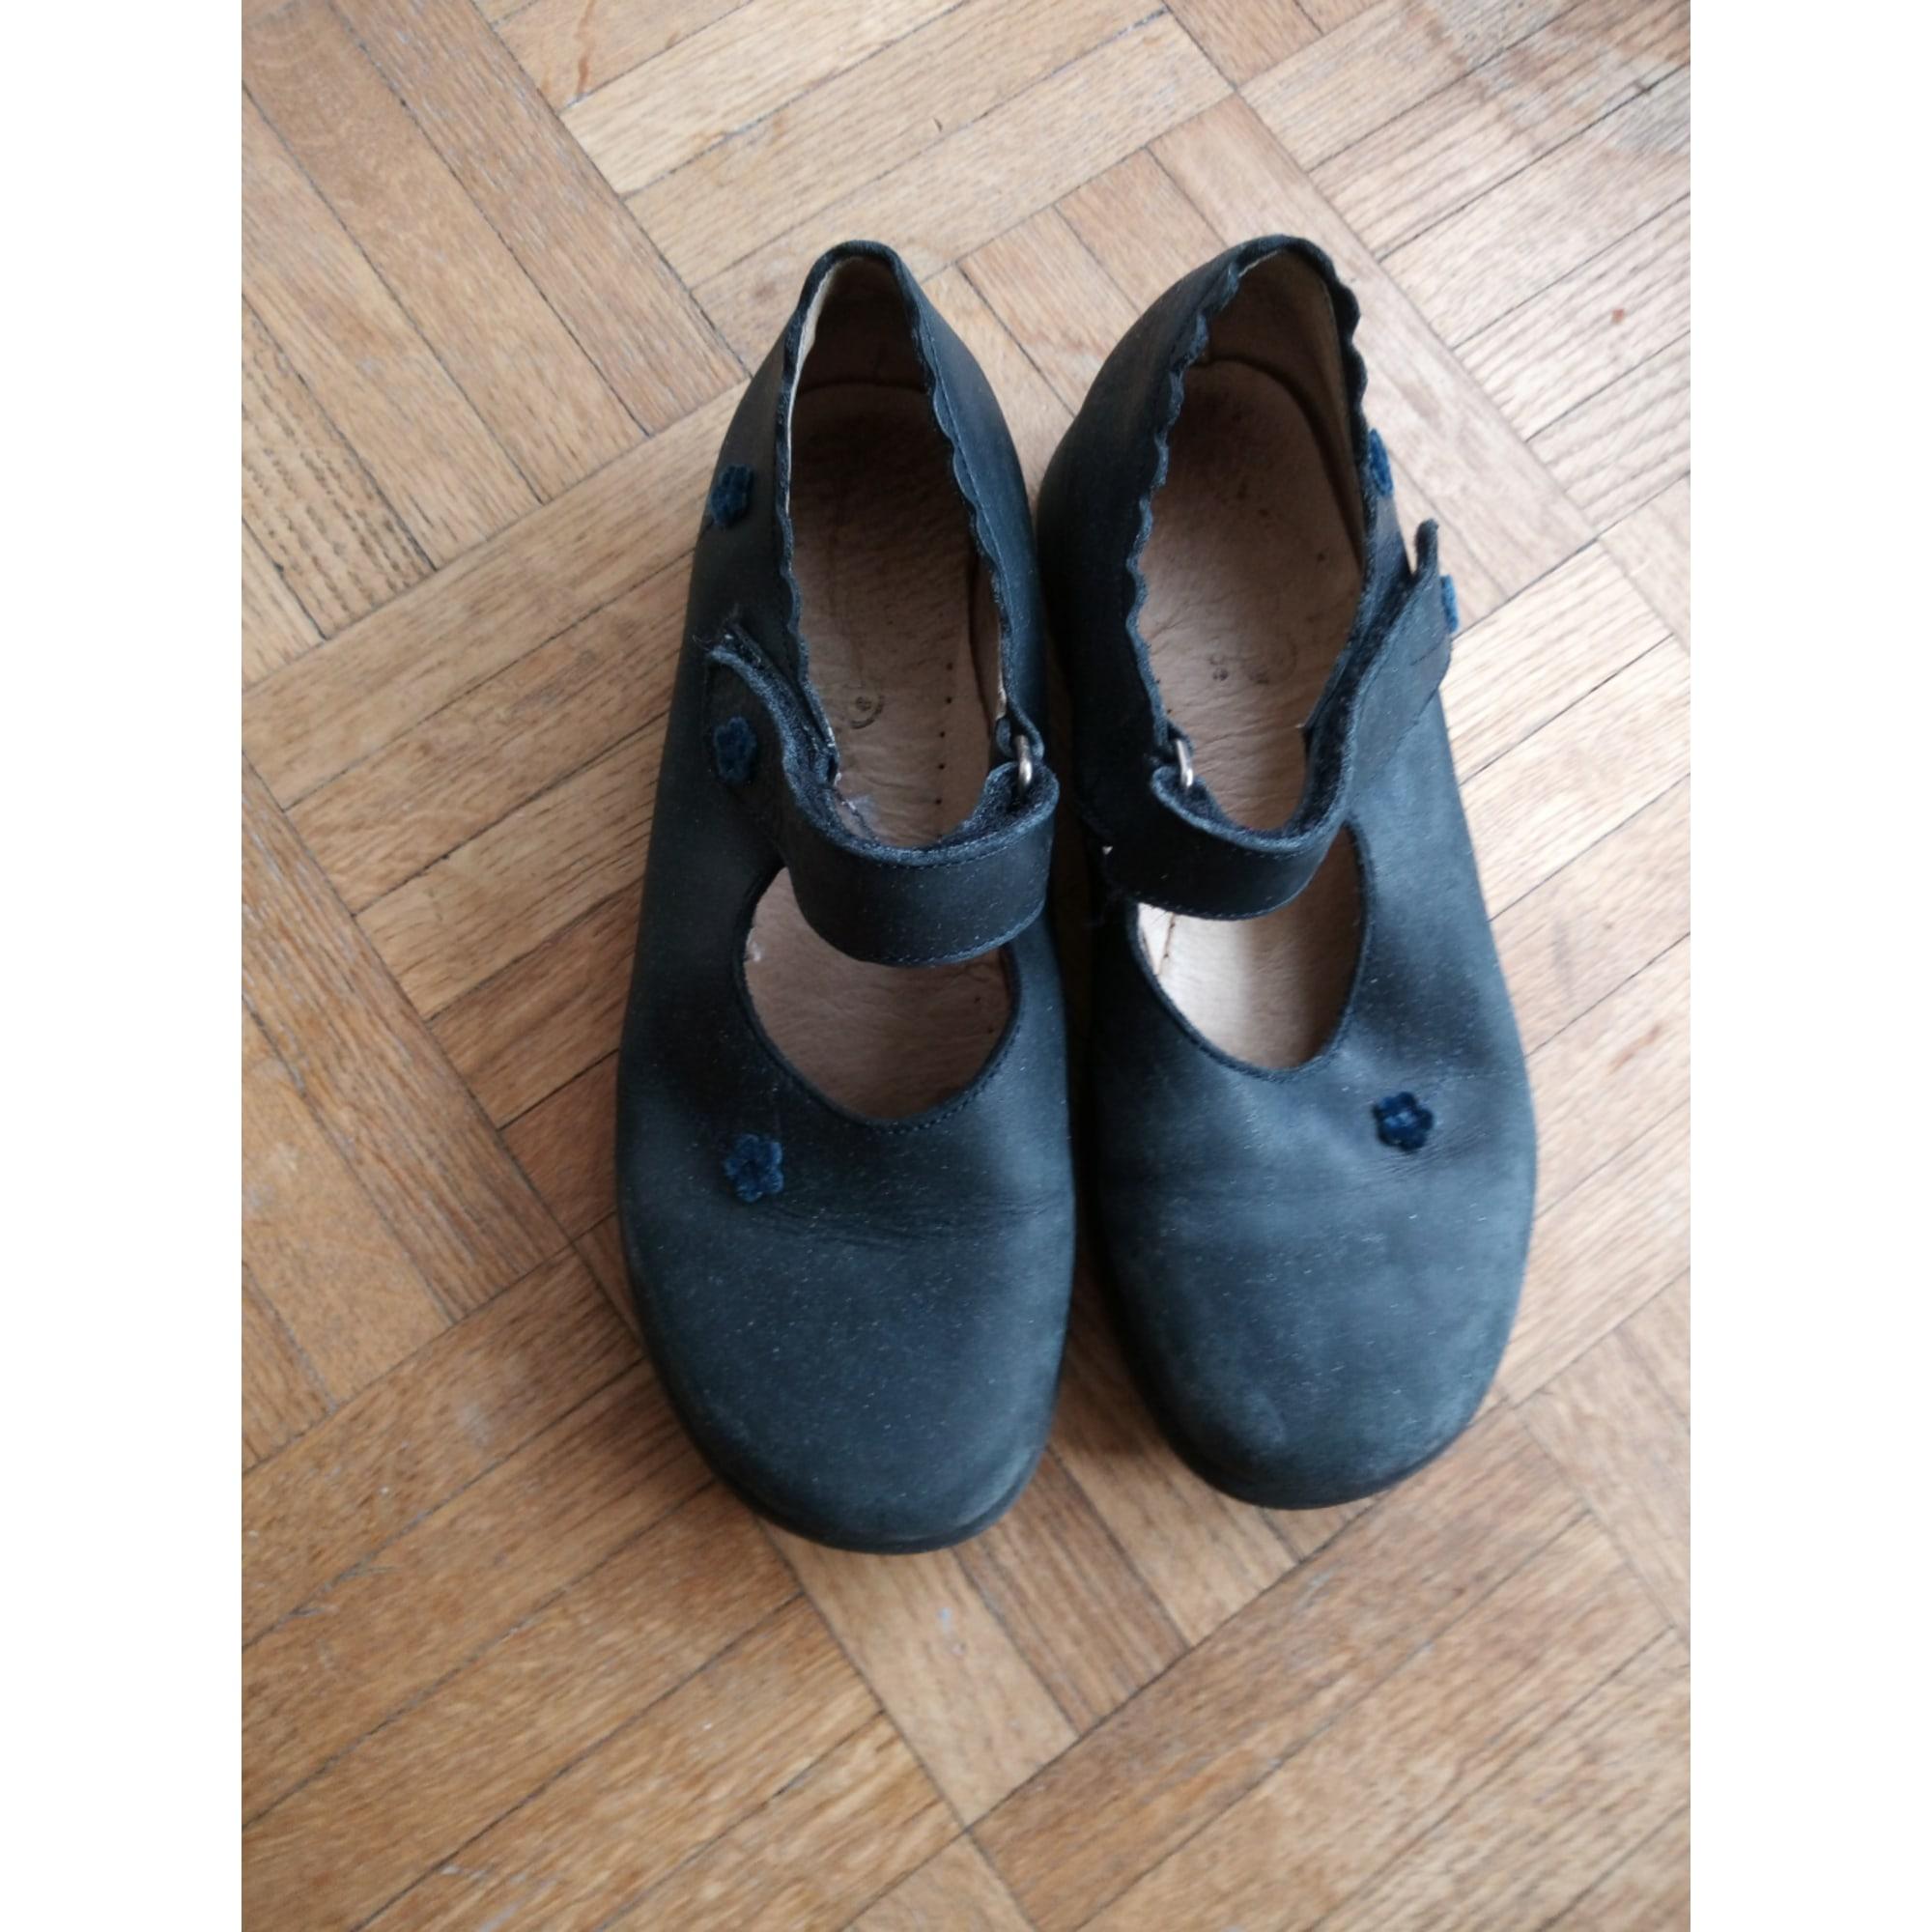 Chaussures à boucle MOD 8 Bleu, bleu marine, bleu turquoise